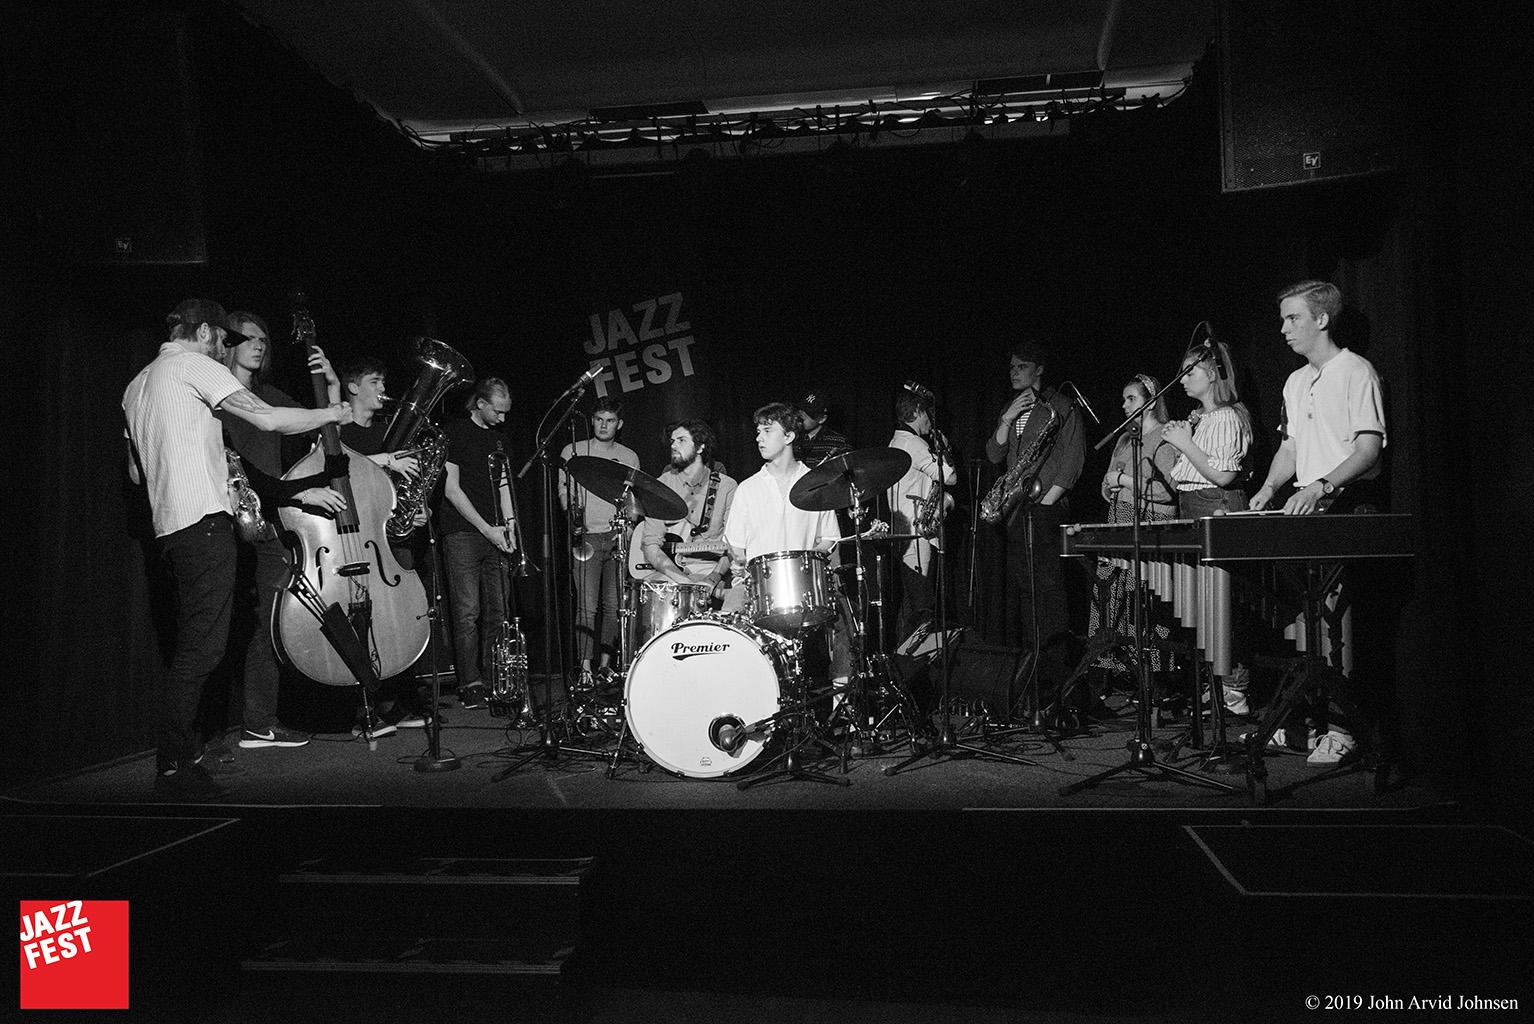 190509 Midtnorsk Ungdomsstorband (Jazzfest Future) @ Byscenen Anneks (foto John Arvid Johnsen) _ 2.jpg